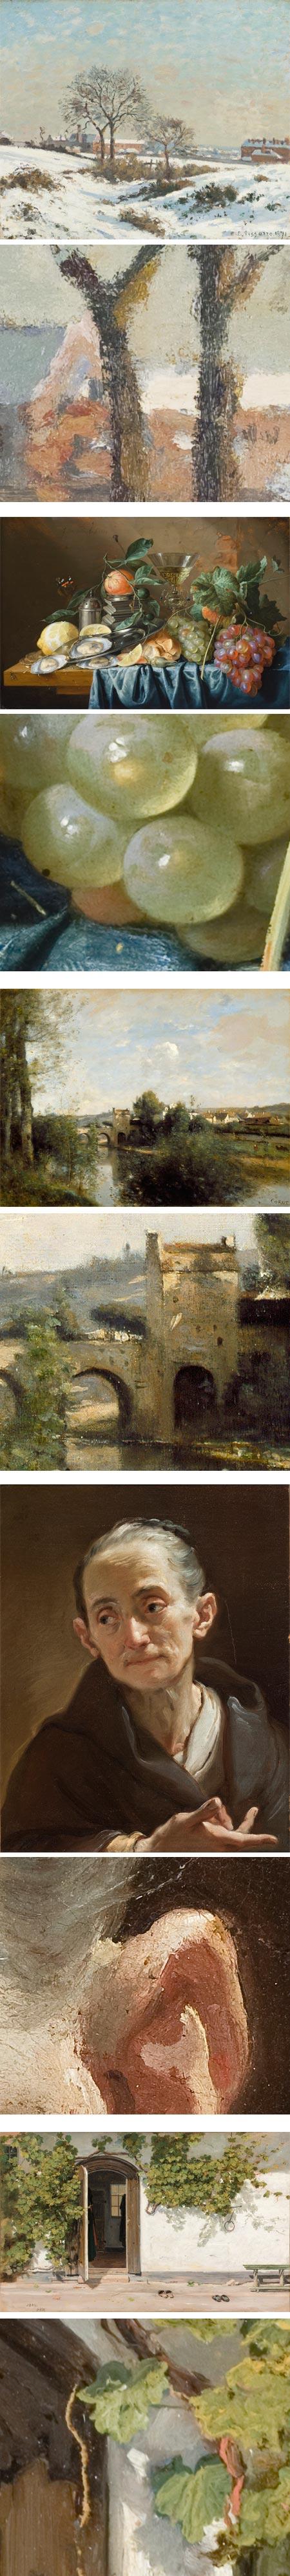 High-res art images from LACMA Image Library: Camille Pissarro, Jan Davidsz de Heem, Camille Corot, Ubaldo Gandolfi, Martinus Rørbye